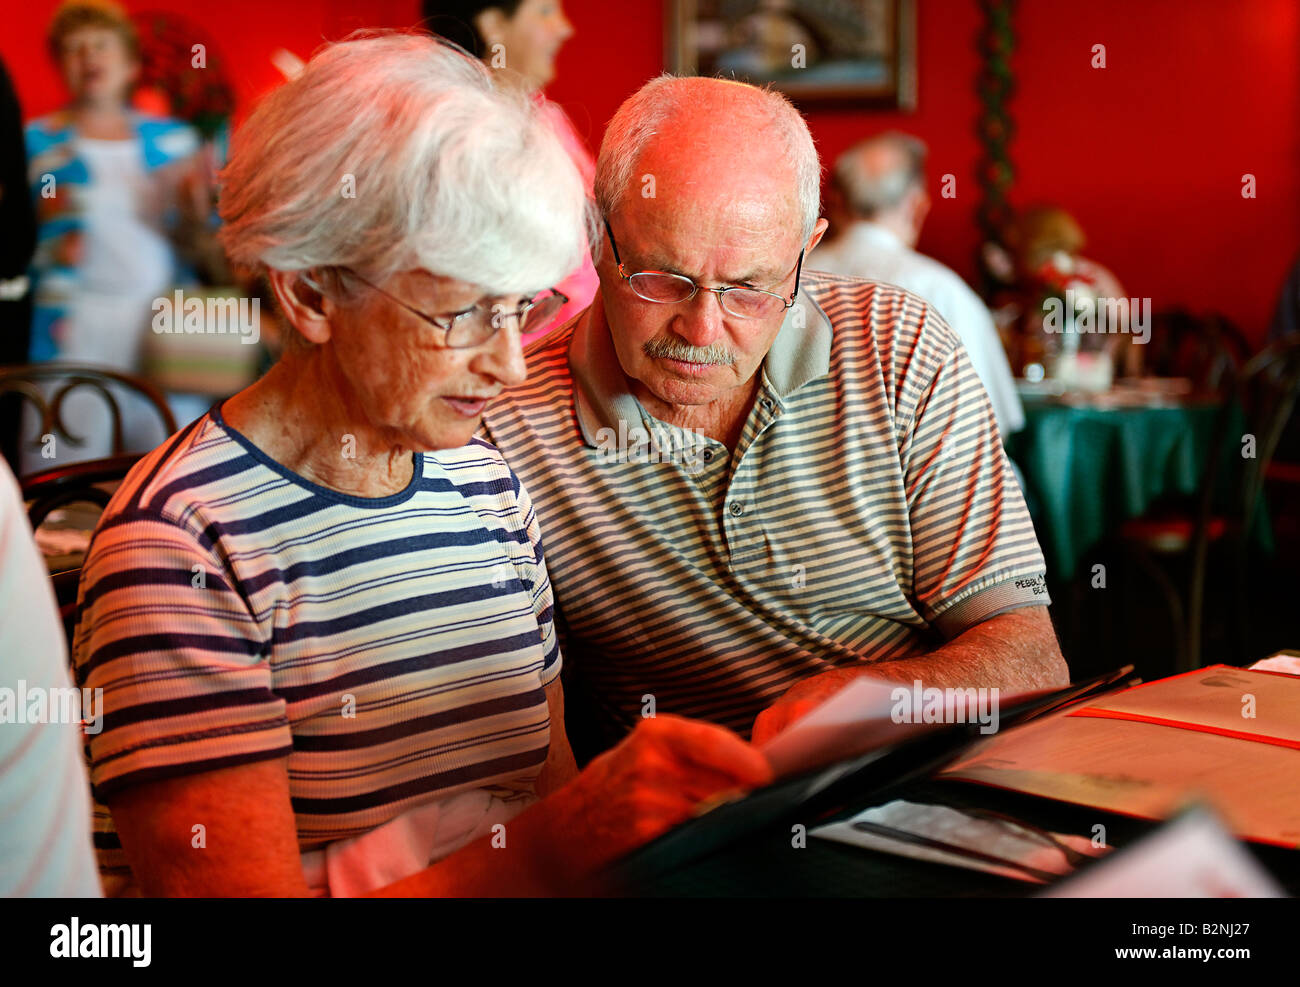 Senior couple reviewing a restaurant menu - Stock Image